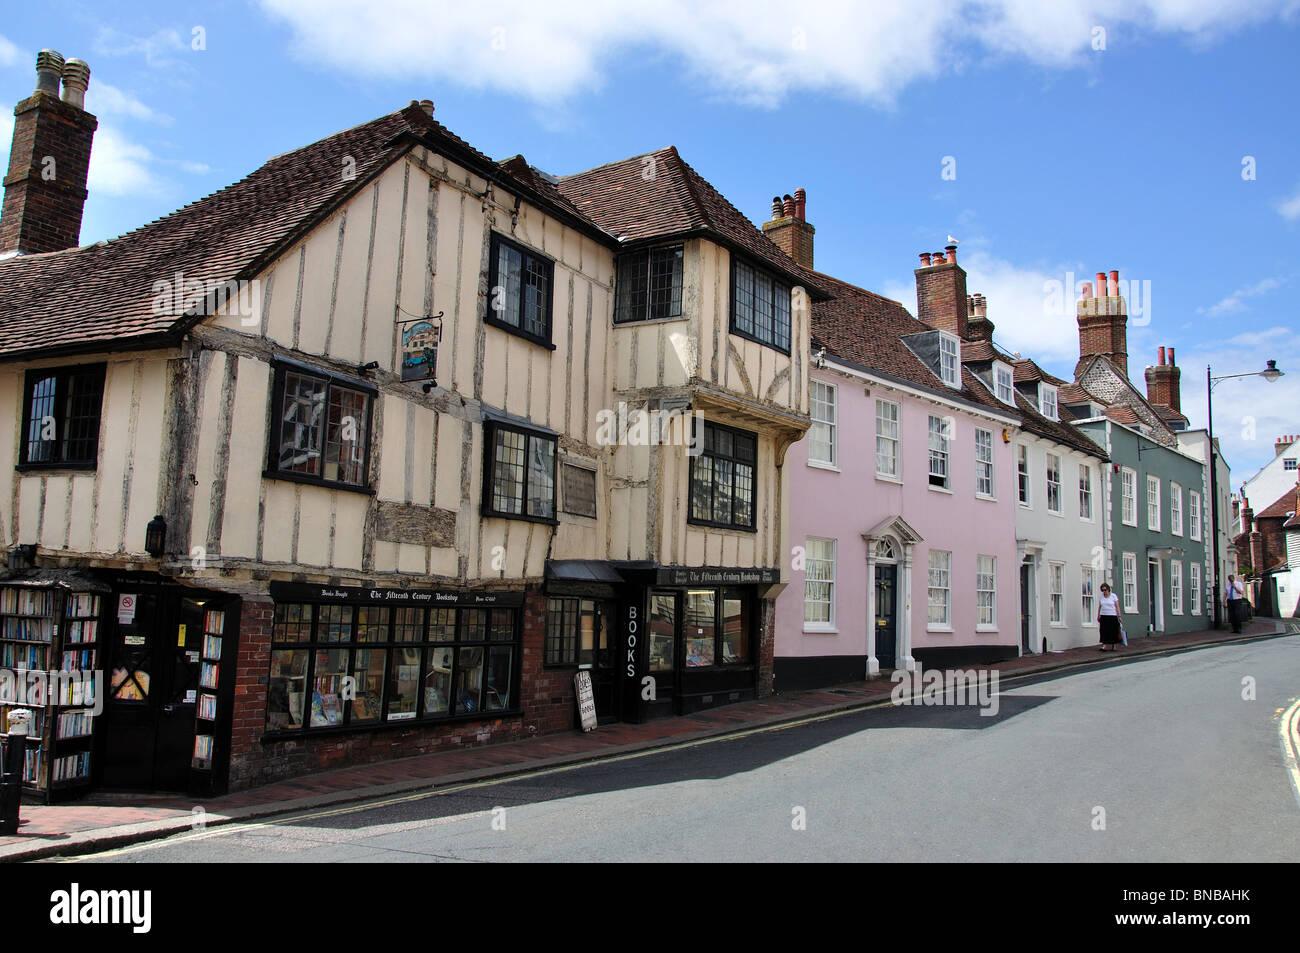 Fifteenth Century Bookshop, High Street, Lewes, East Sussex, England, United Kingdom - Stock Image